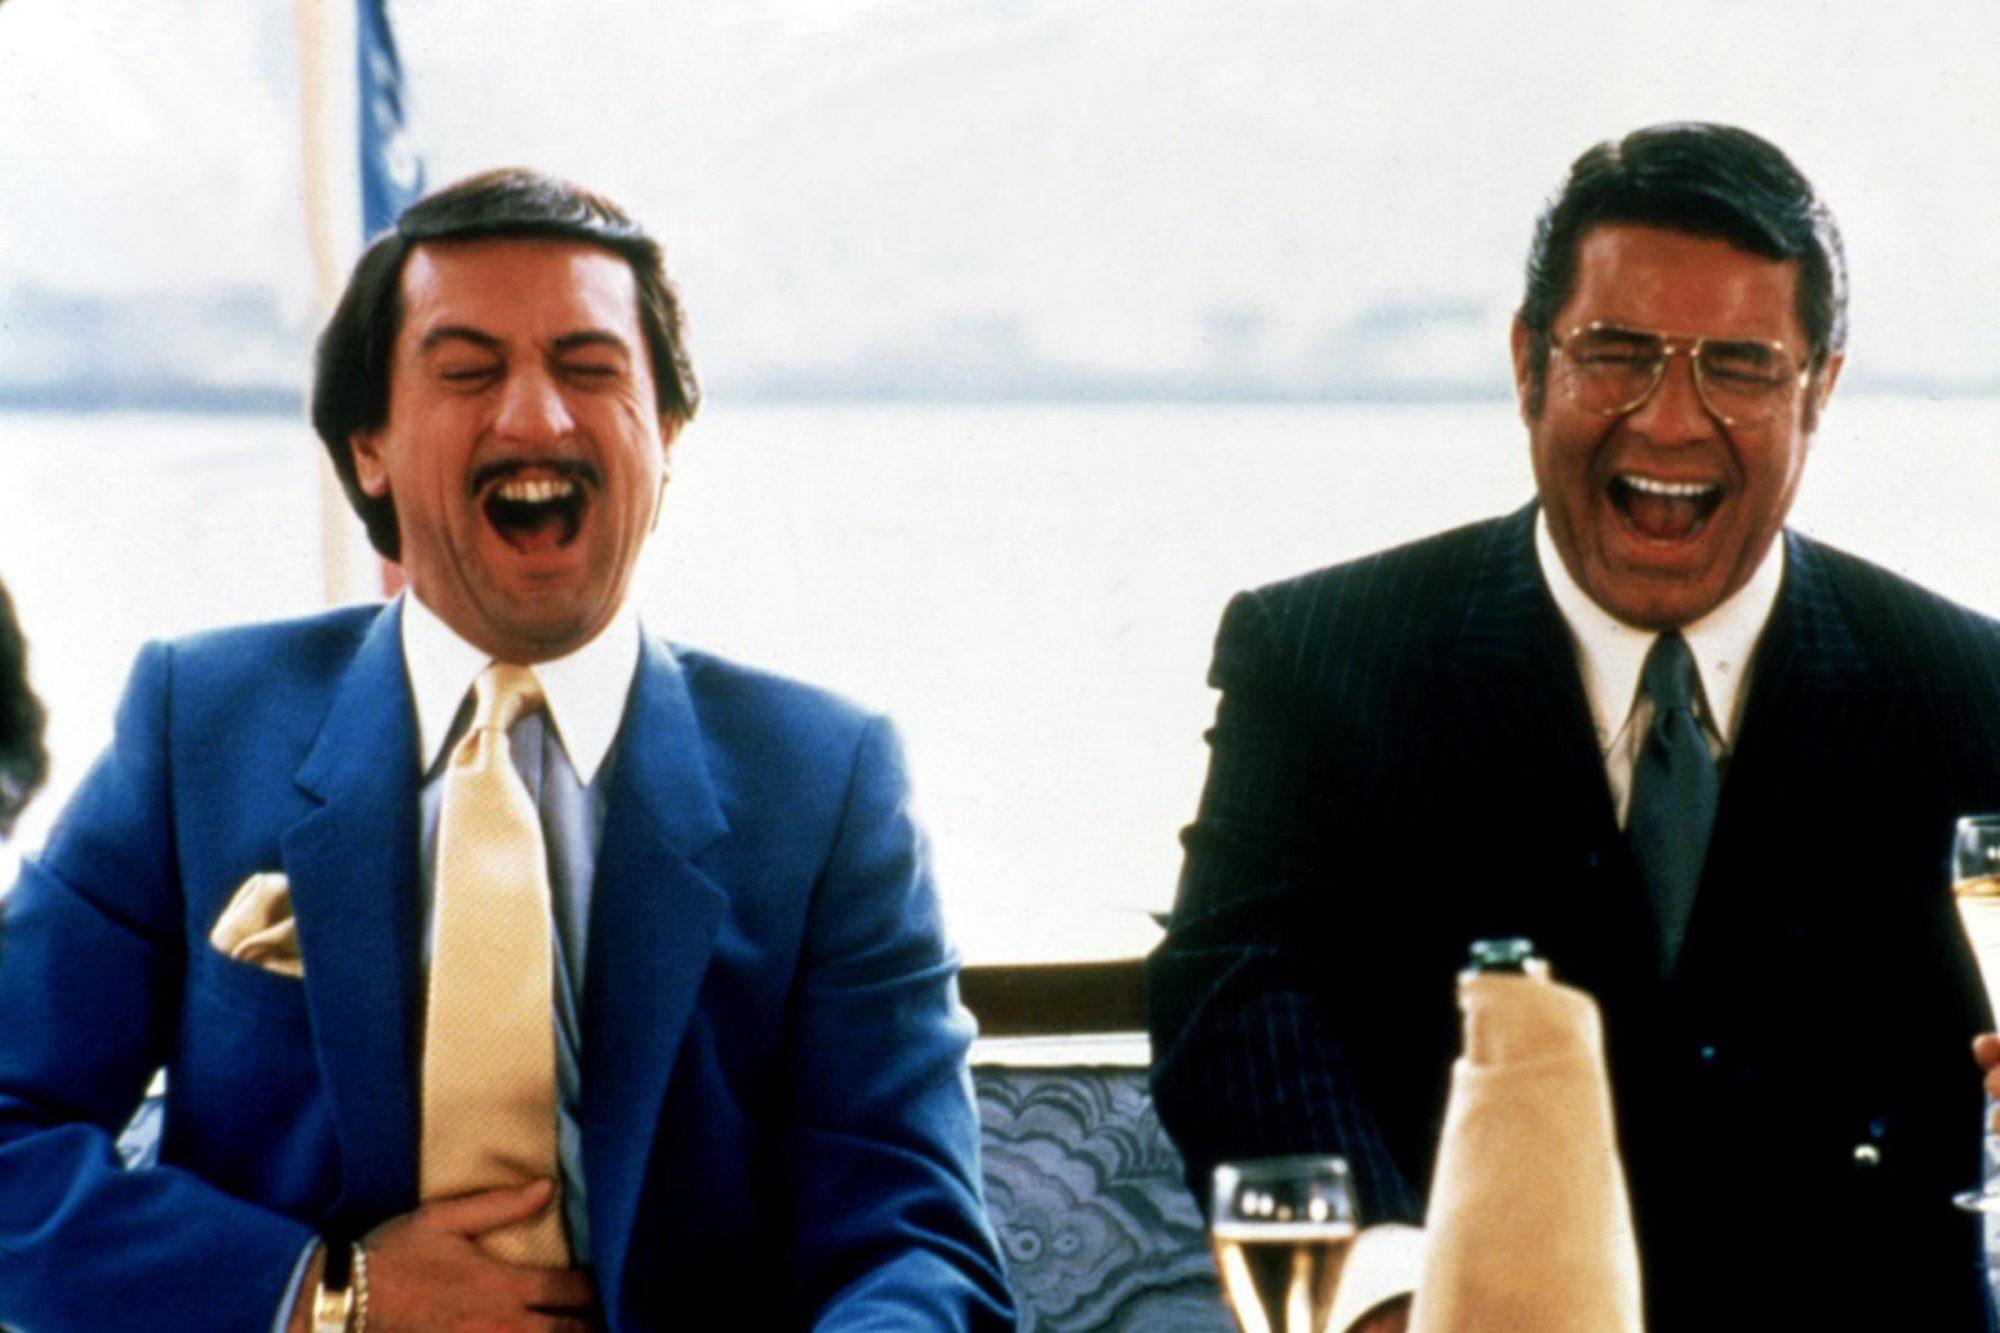 THE KING OF COMEDY, Robert De Niro, Jerry Lewis, 1983. TM and ©Copyright Twentieth Century Fox Film